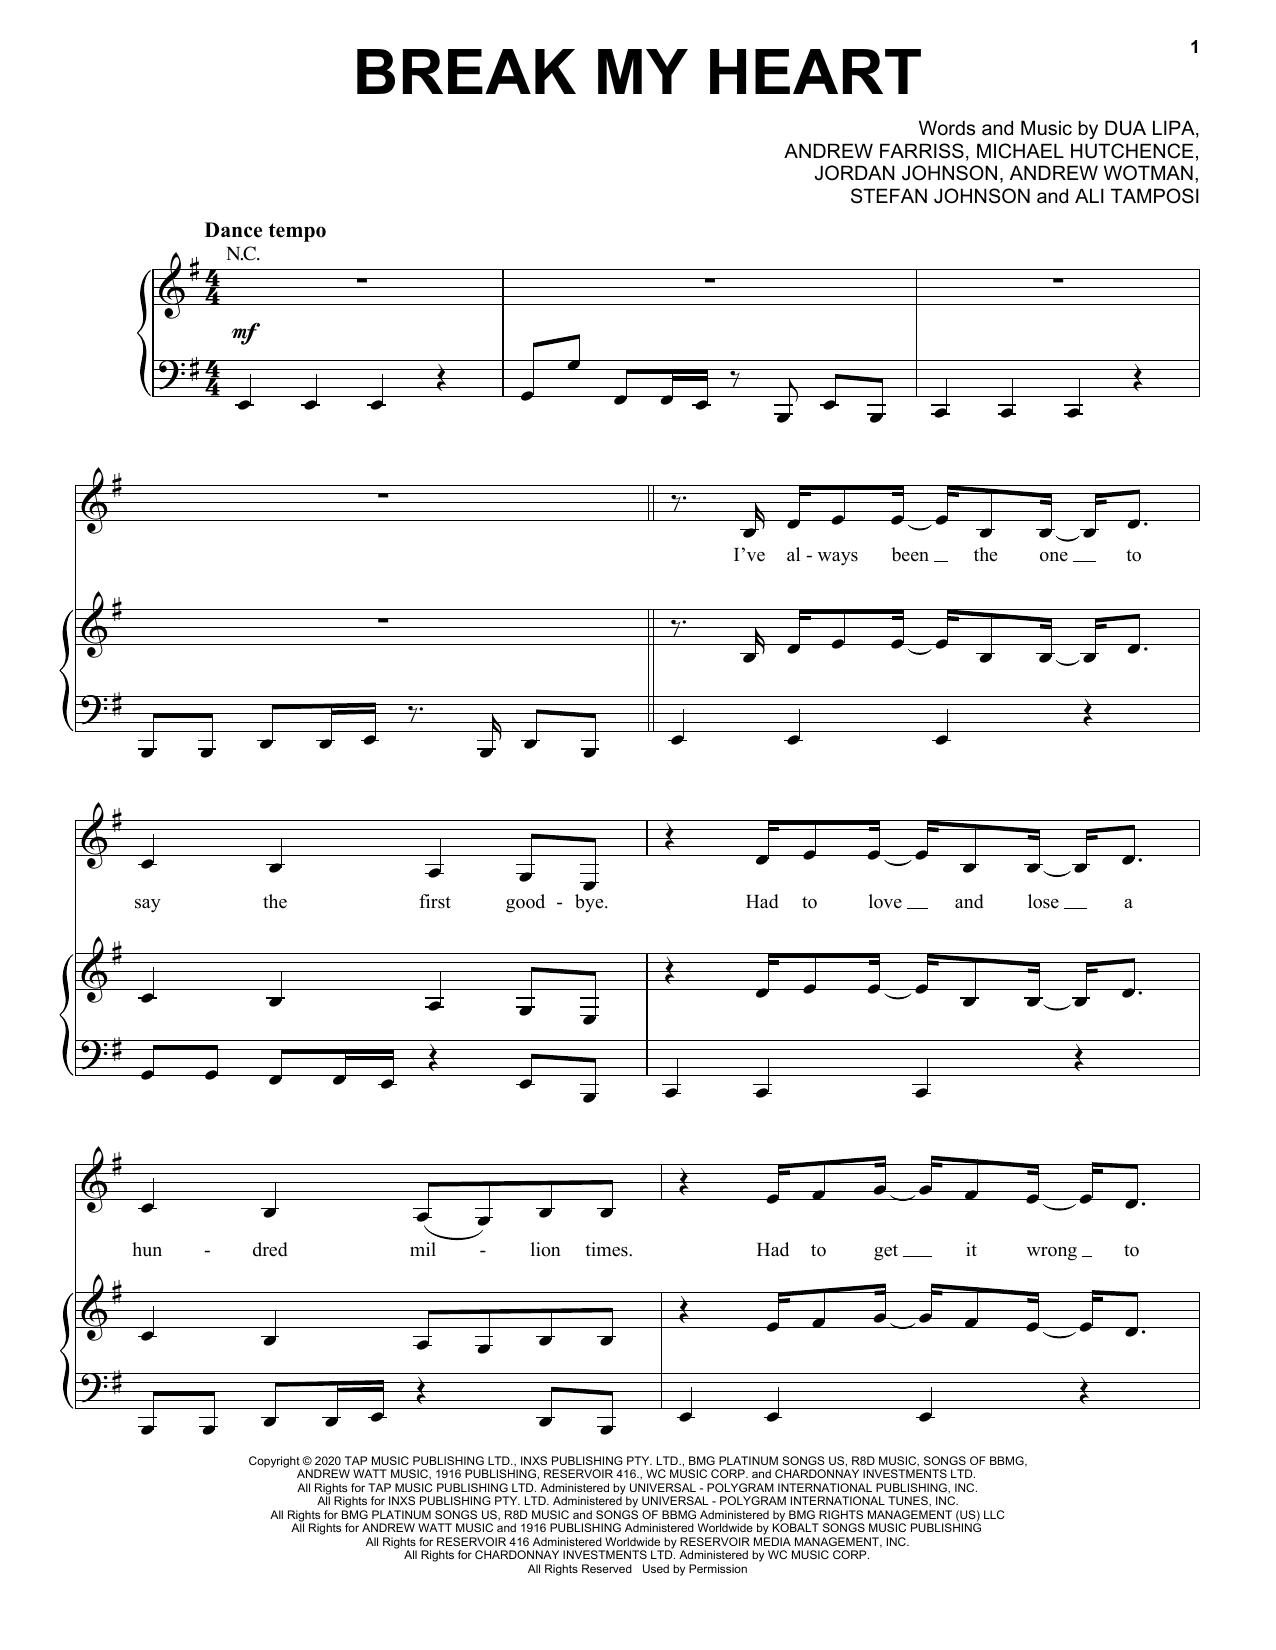 Dua Lipa Break My Heart sheet music notes and chords. Download Printable PDF.